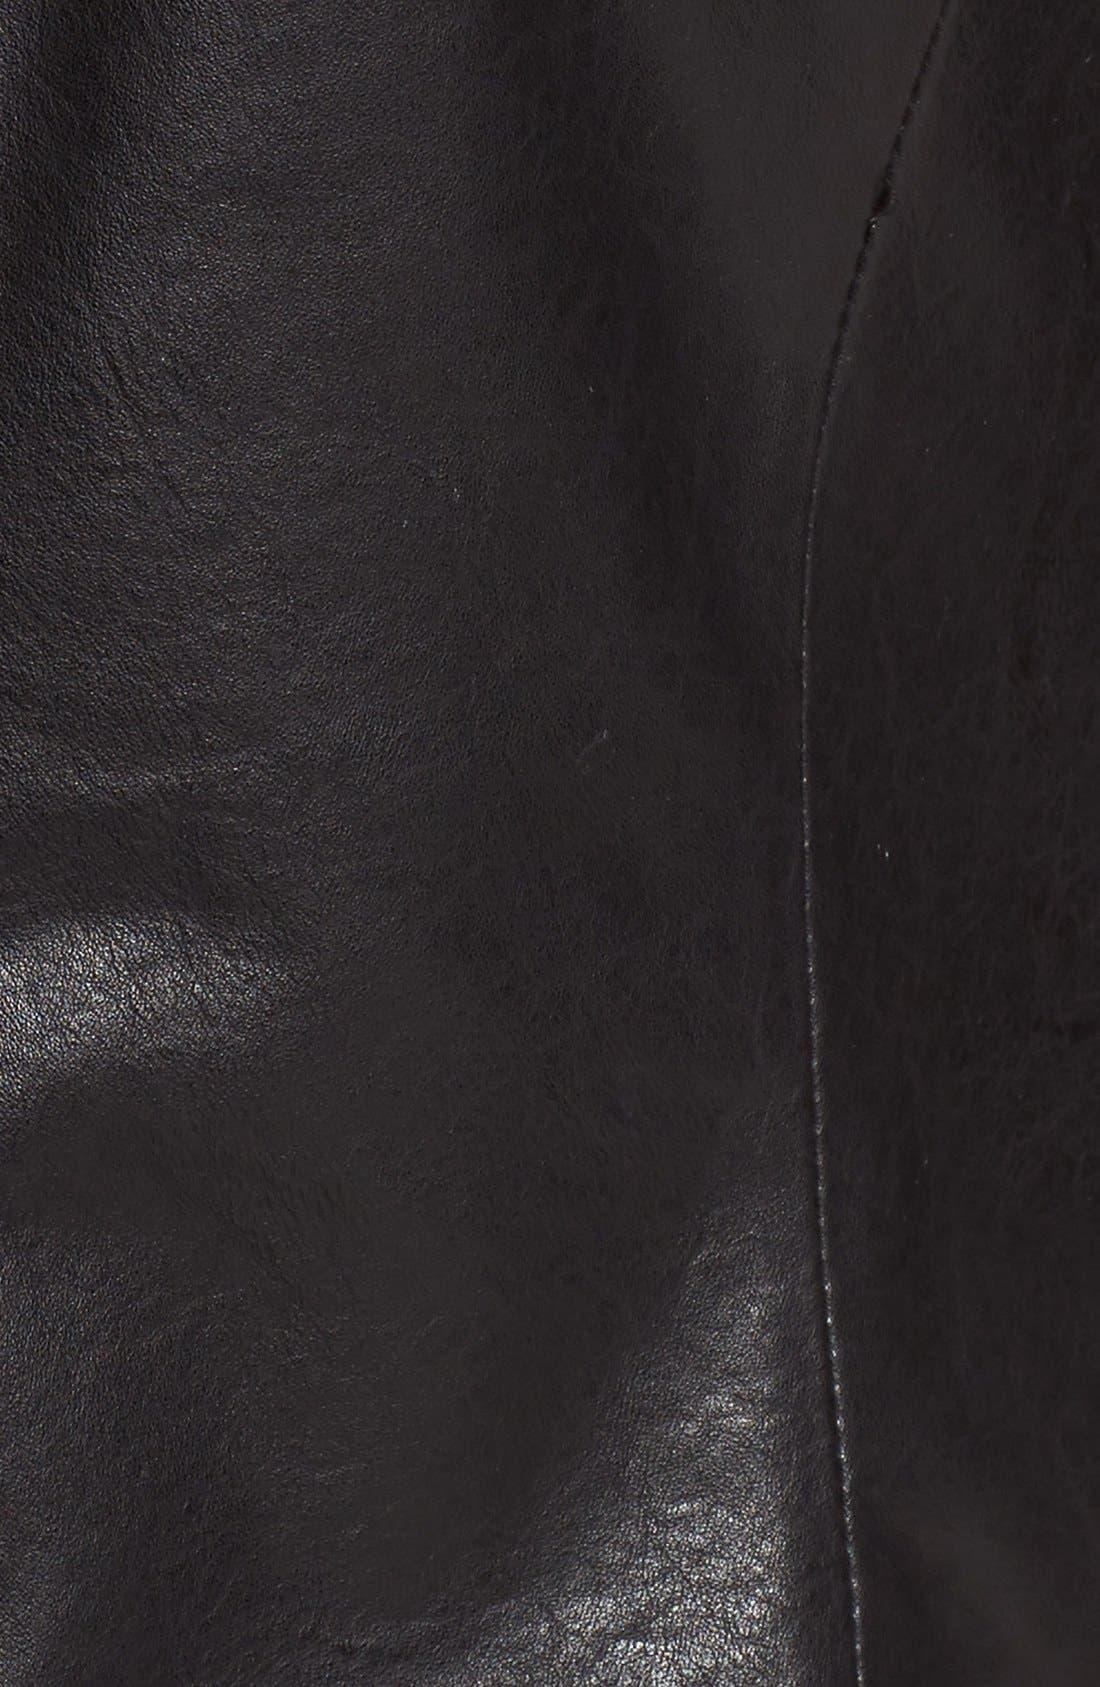 Fringe Trim Glen Plaid Faux Leather Moto Jacket,                             Alternate thumbnail 5, color,                             Black/ White Plaid